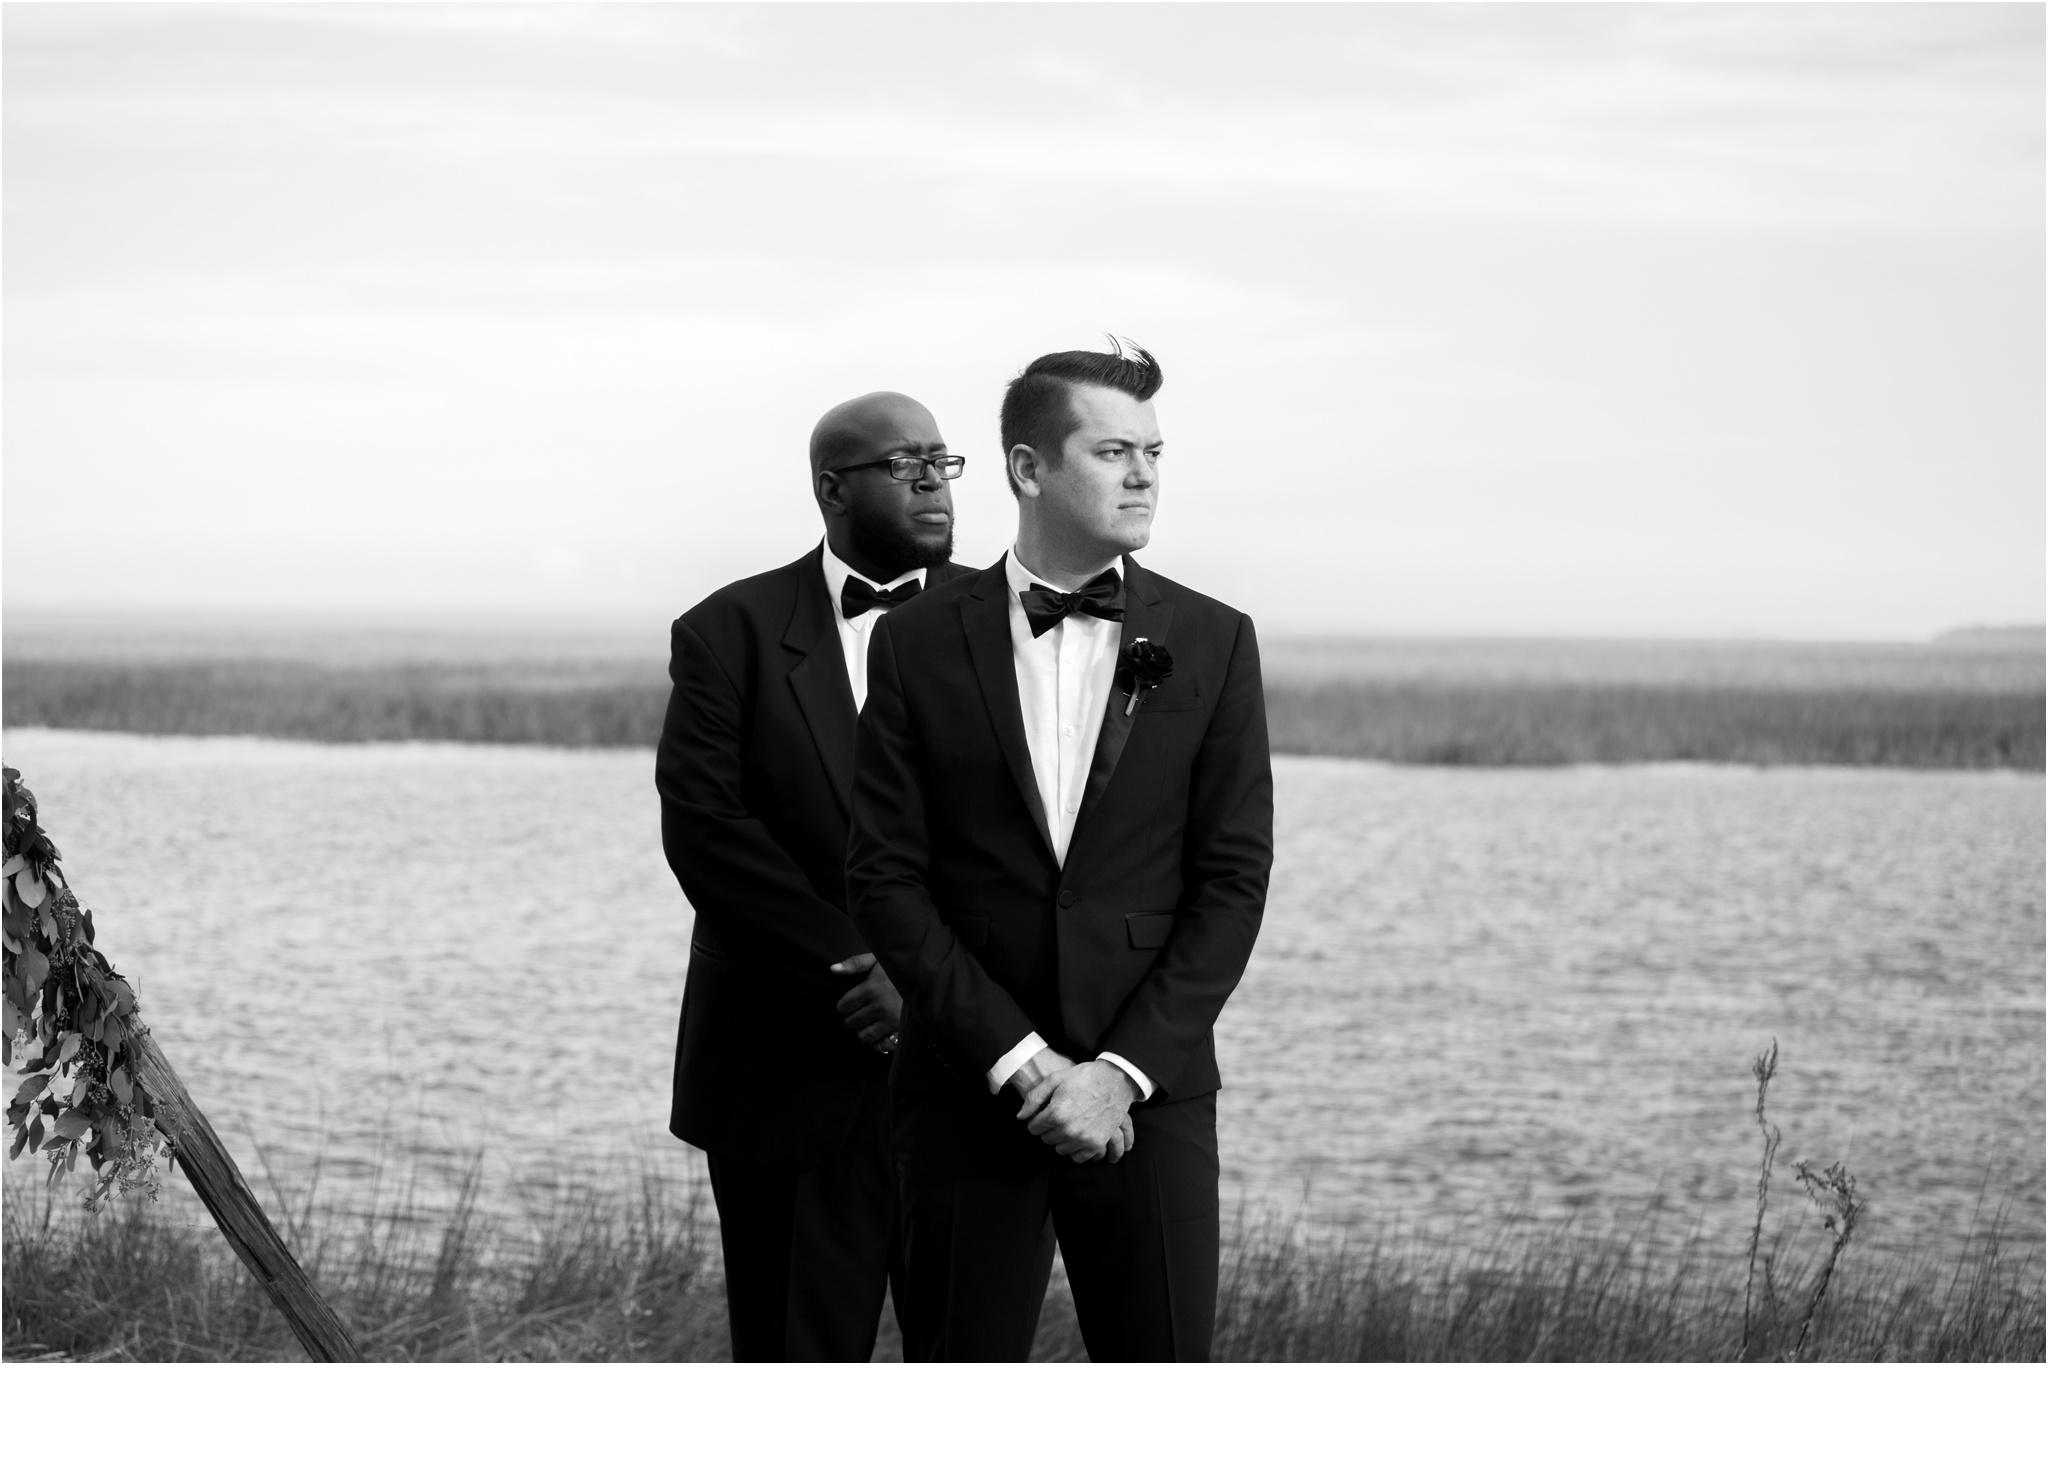 Rainey_Gregg_Photography_St._Simons_Island_Georgia_California_Wedding_Portrait_Photography_0810.jpg